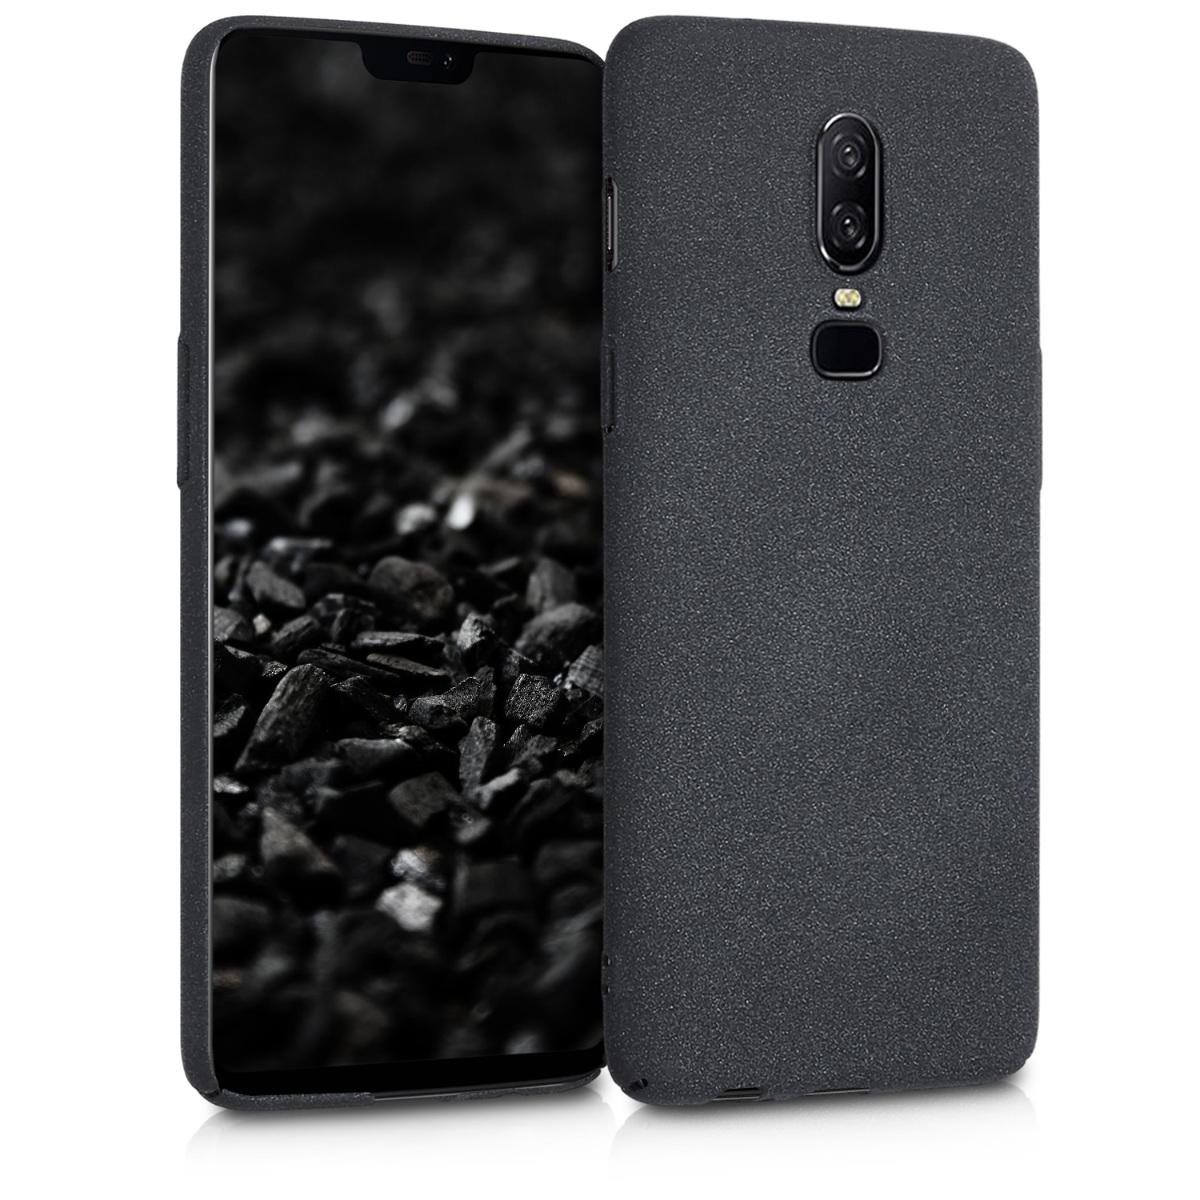 KW Σκληρή θήκη OnePlus 6 - Black Matte (47643.47)